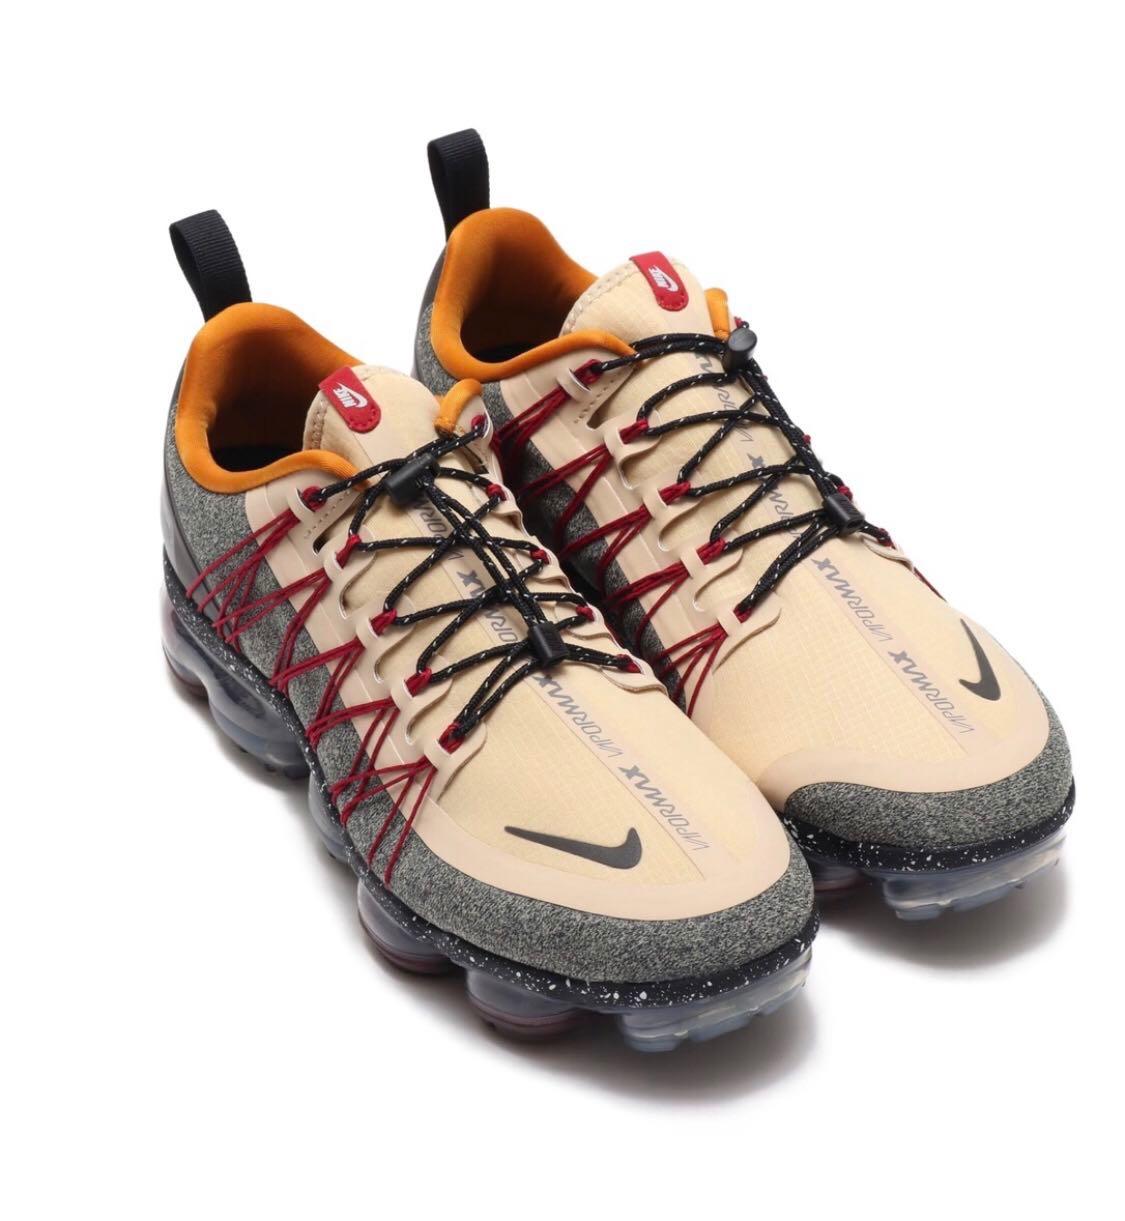 b8e2b93bf7a0d Nike Air Vapormax Utility - price reduced